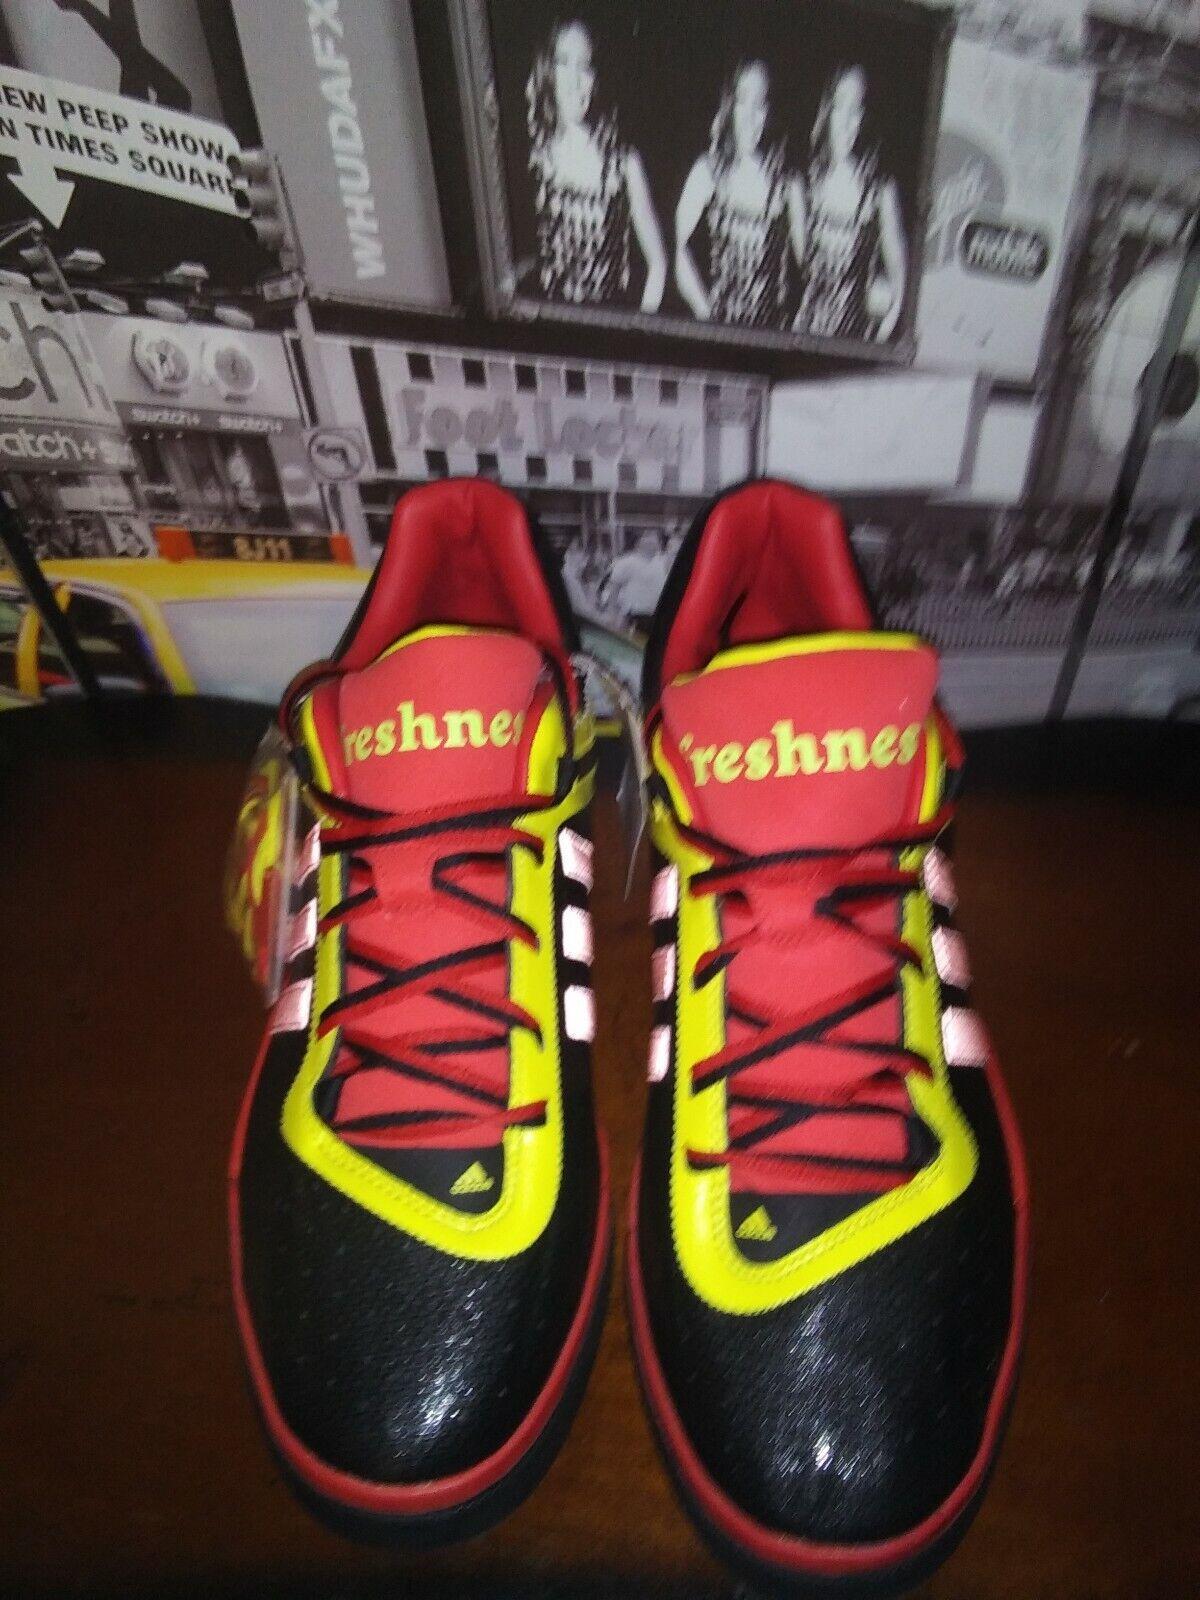 090420c535b 2010 Adidas Top Ten Premium Lo Size 13 Style G06159 RARE Athletic Sneakers